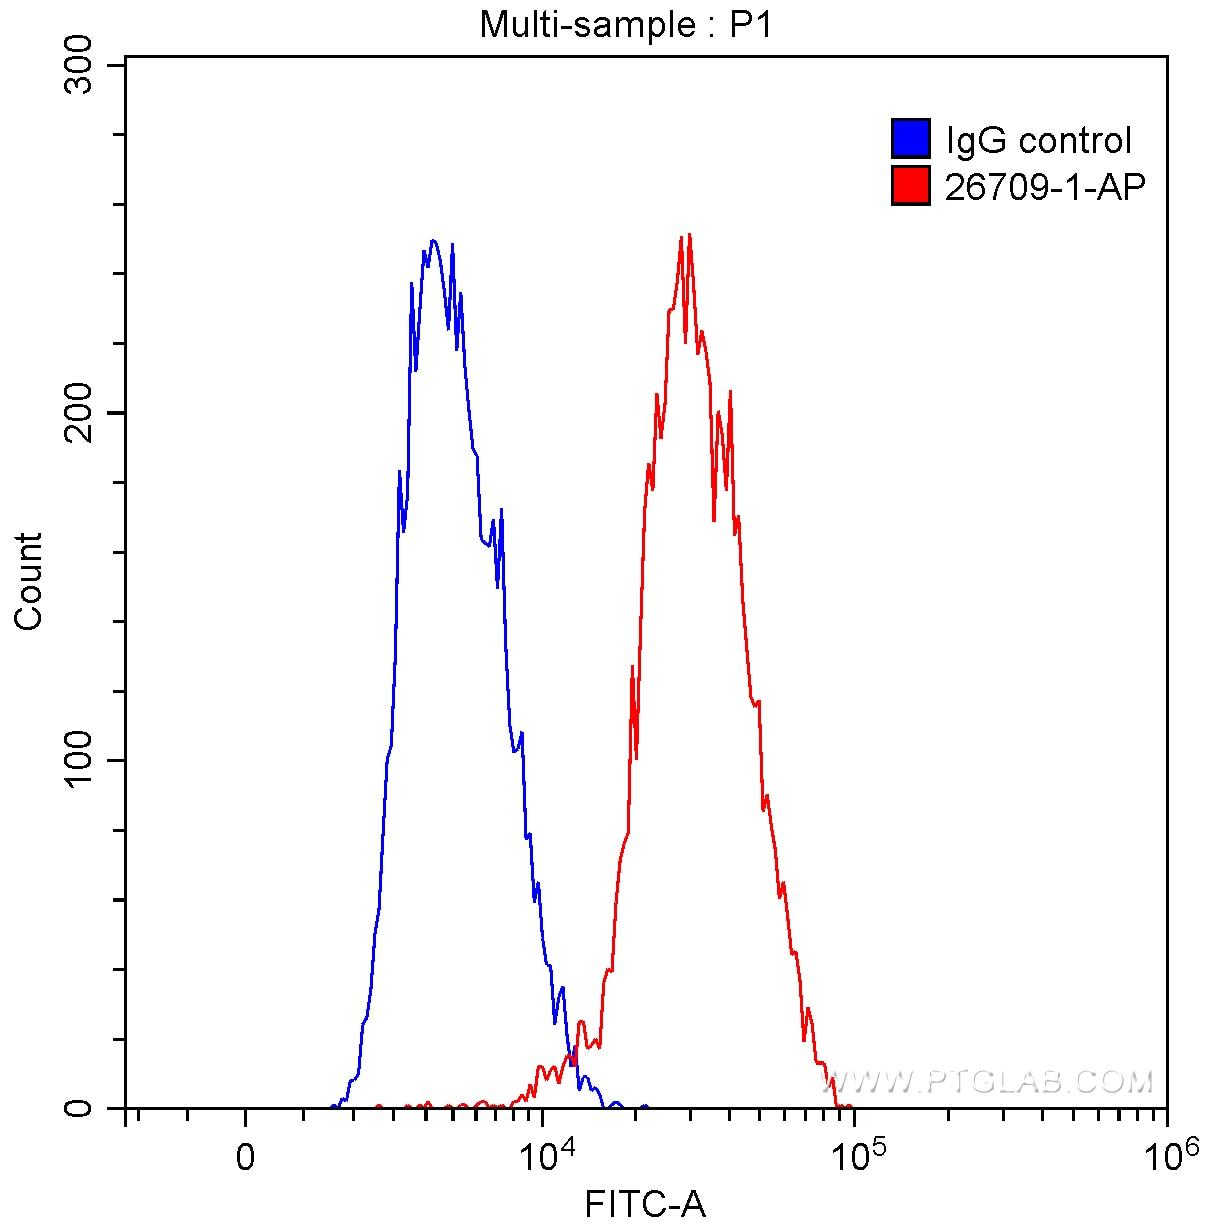 FC experiment of Ramos using 26709-1-AP